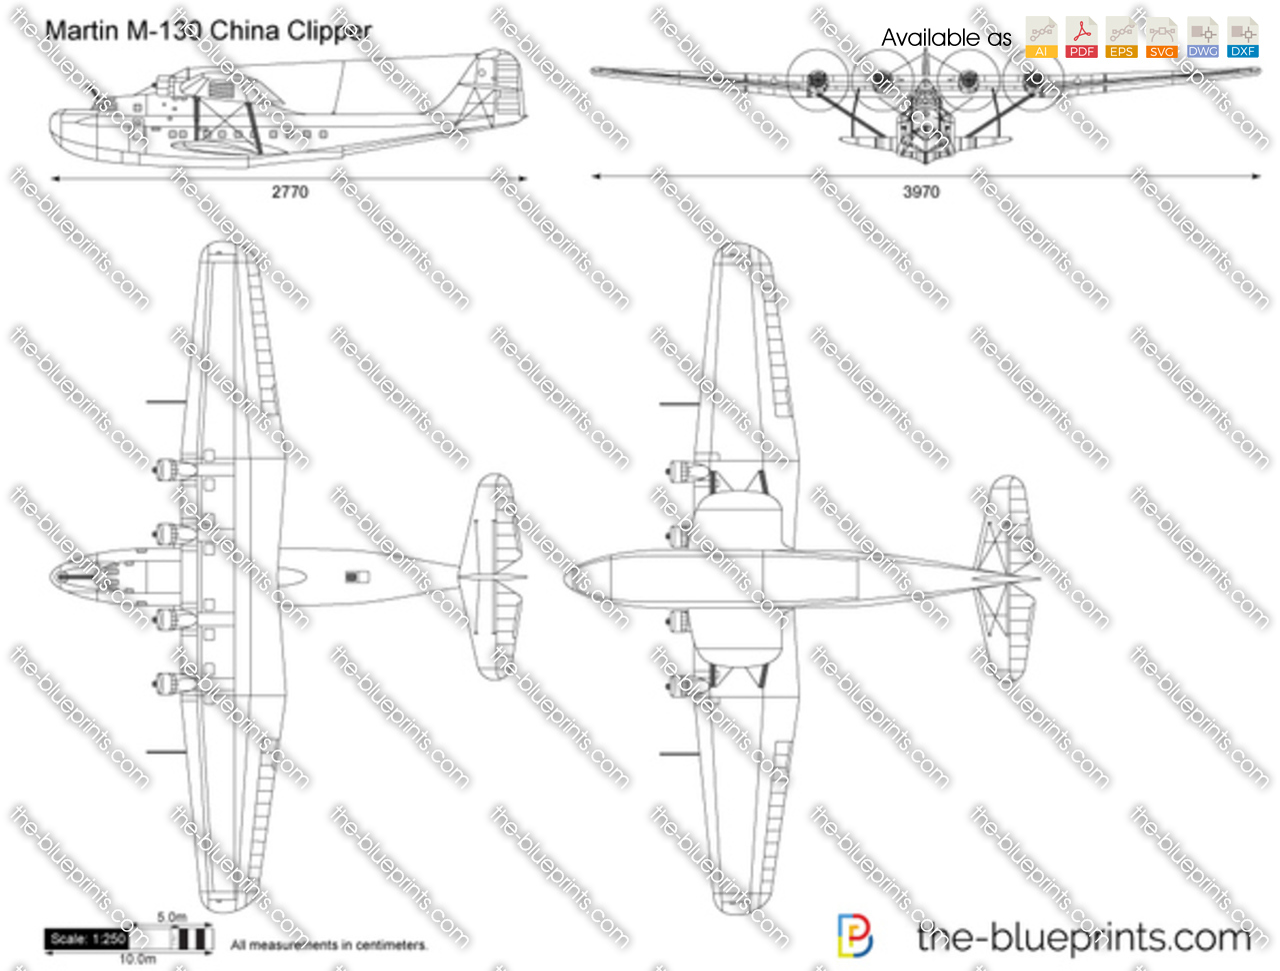 Martin M-130 China Clipper